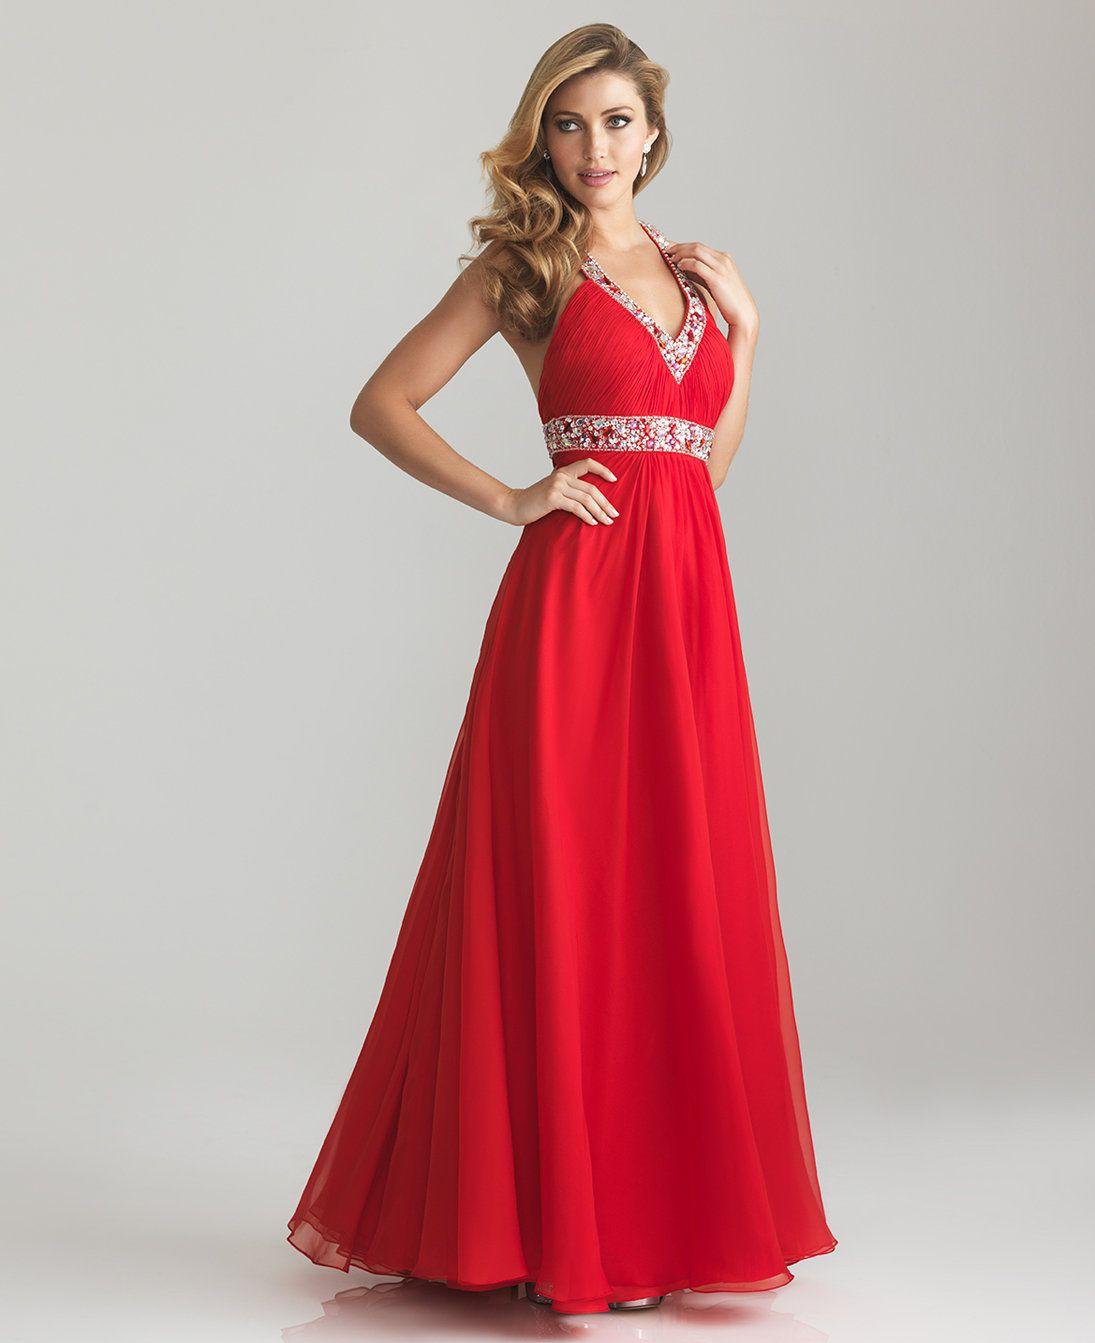 Red chiffon beaded empire waist halter prom dress unique vintage